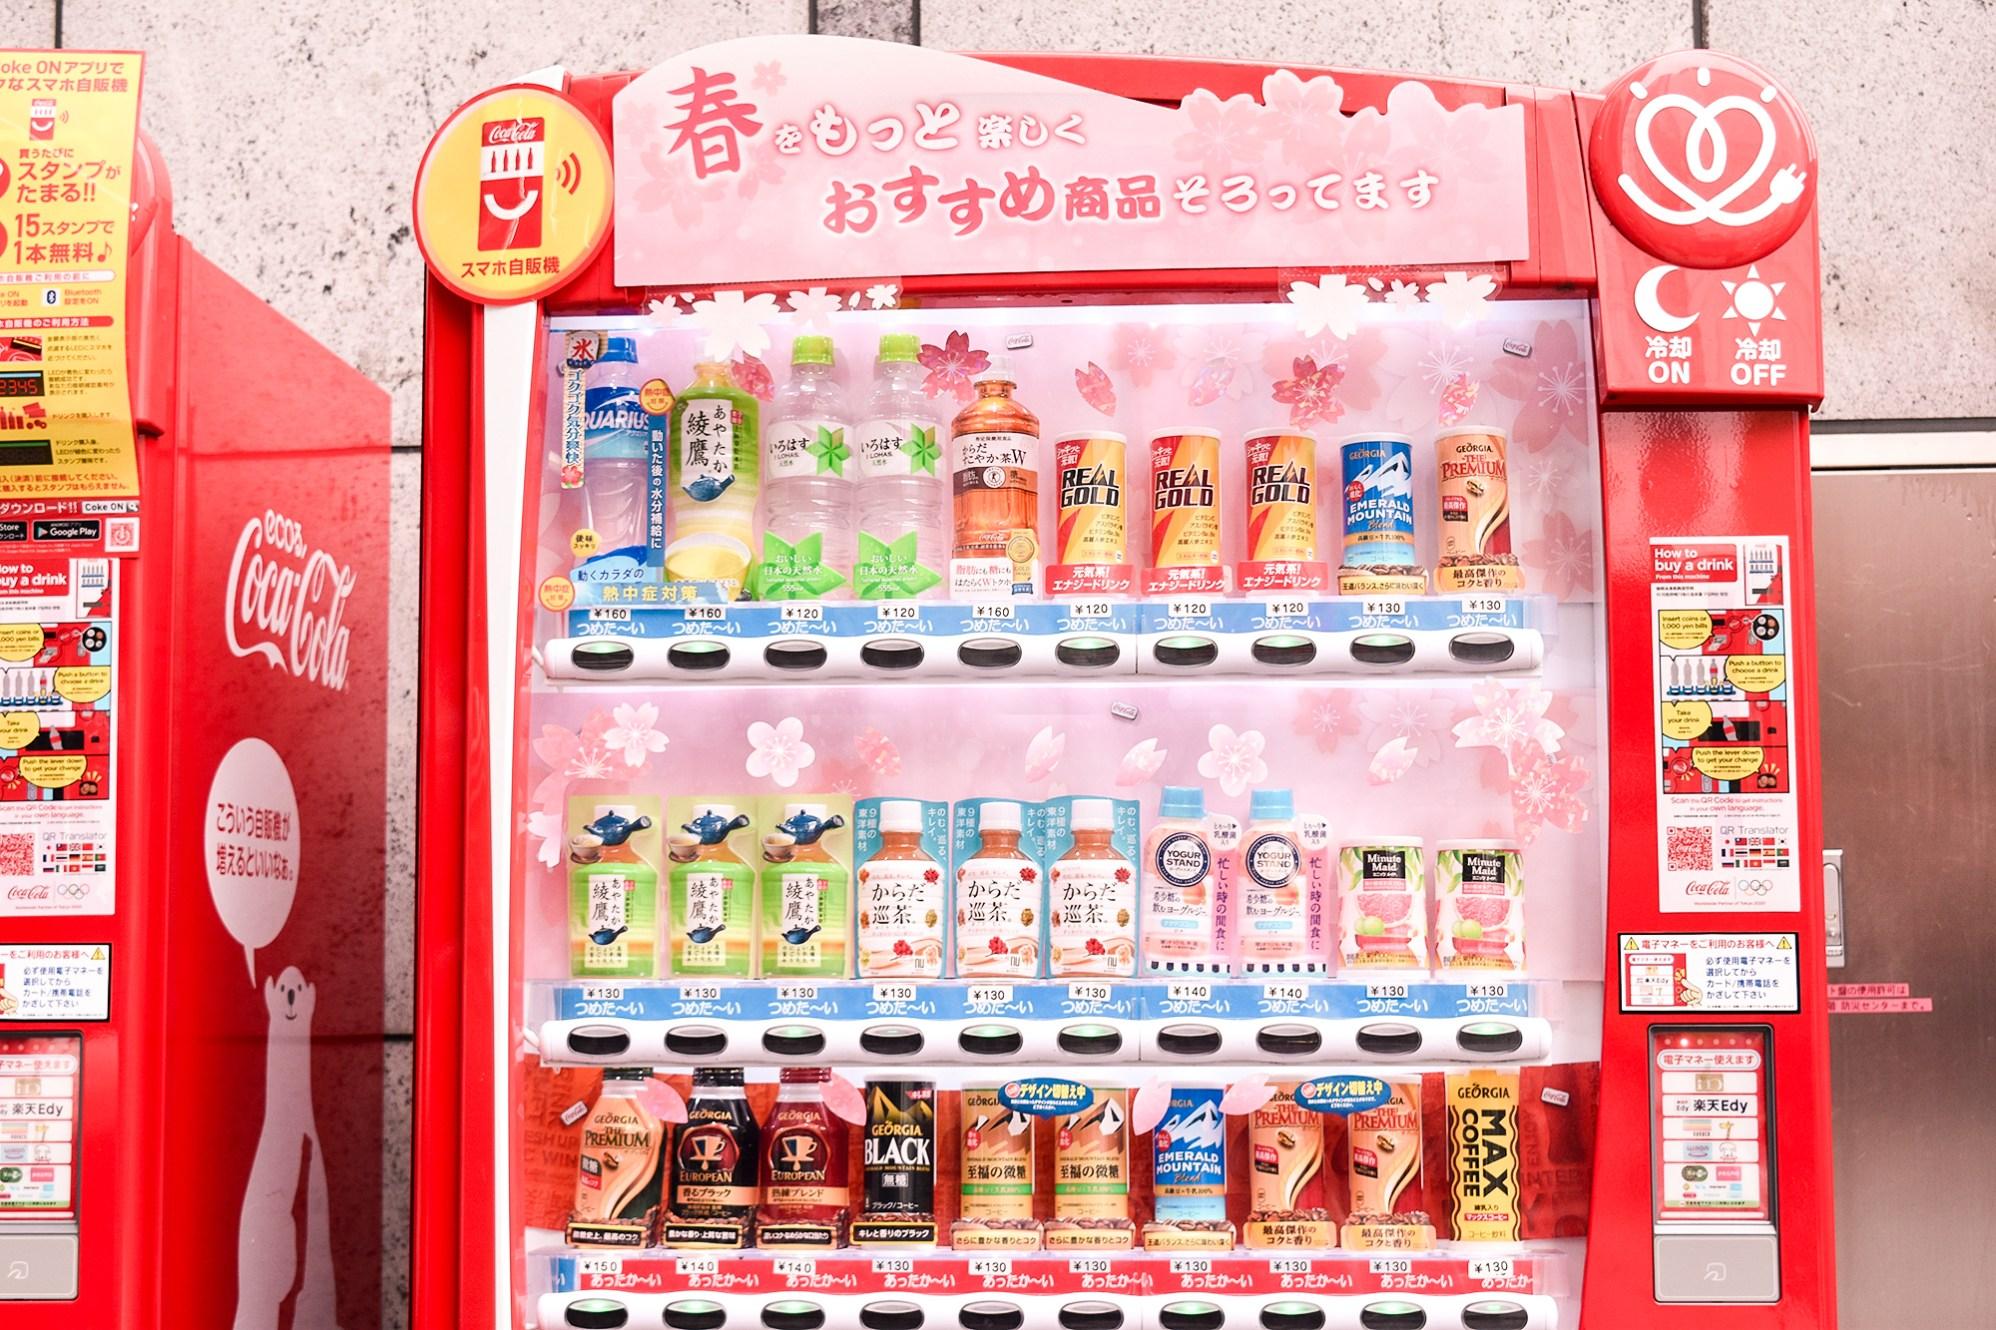 Spring-themed vending machine in Akihabara